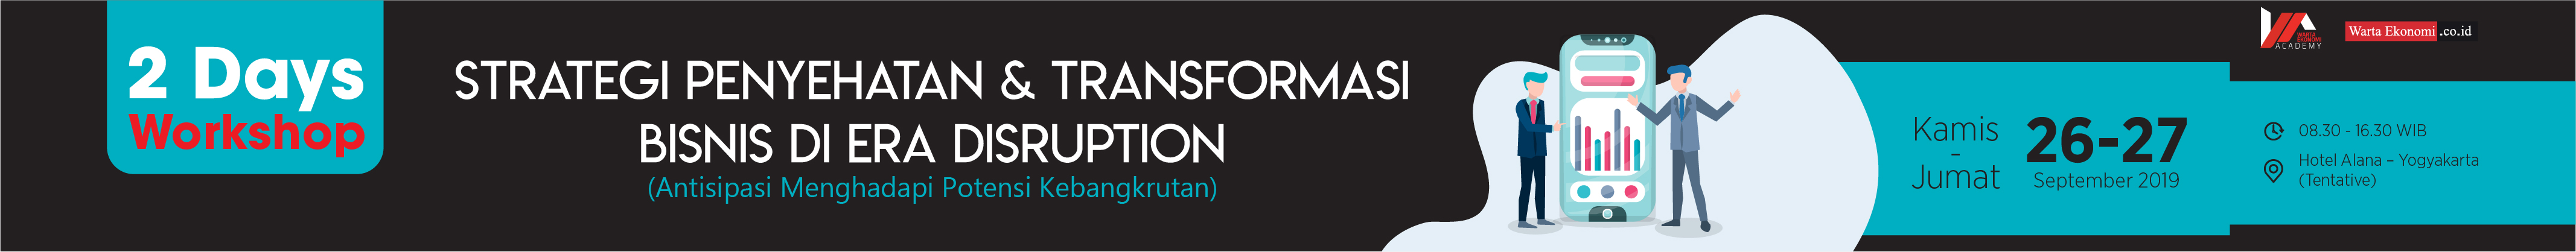 WE Academy: Transformasi Bisnis